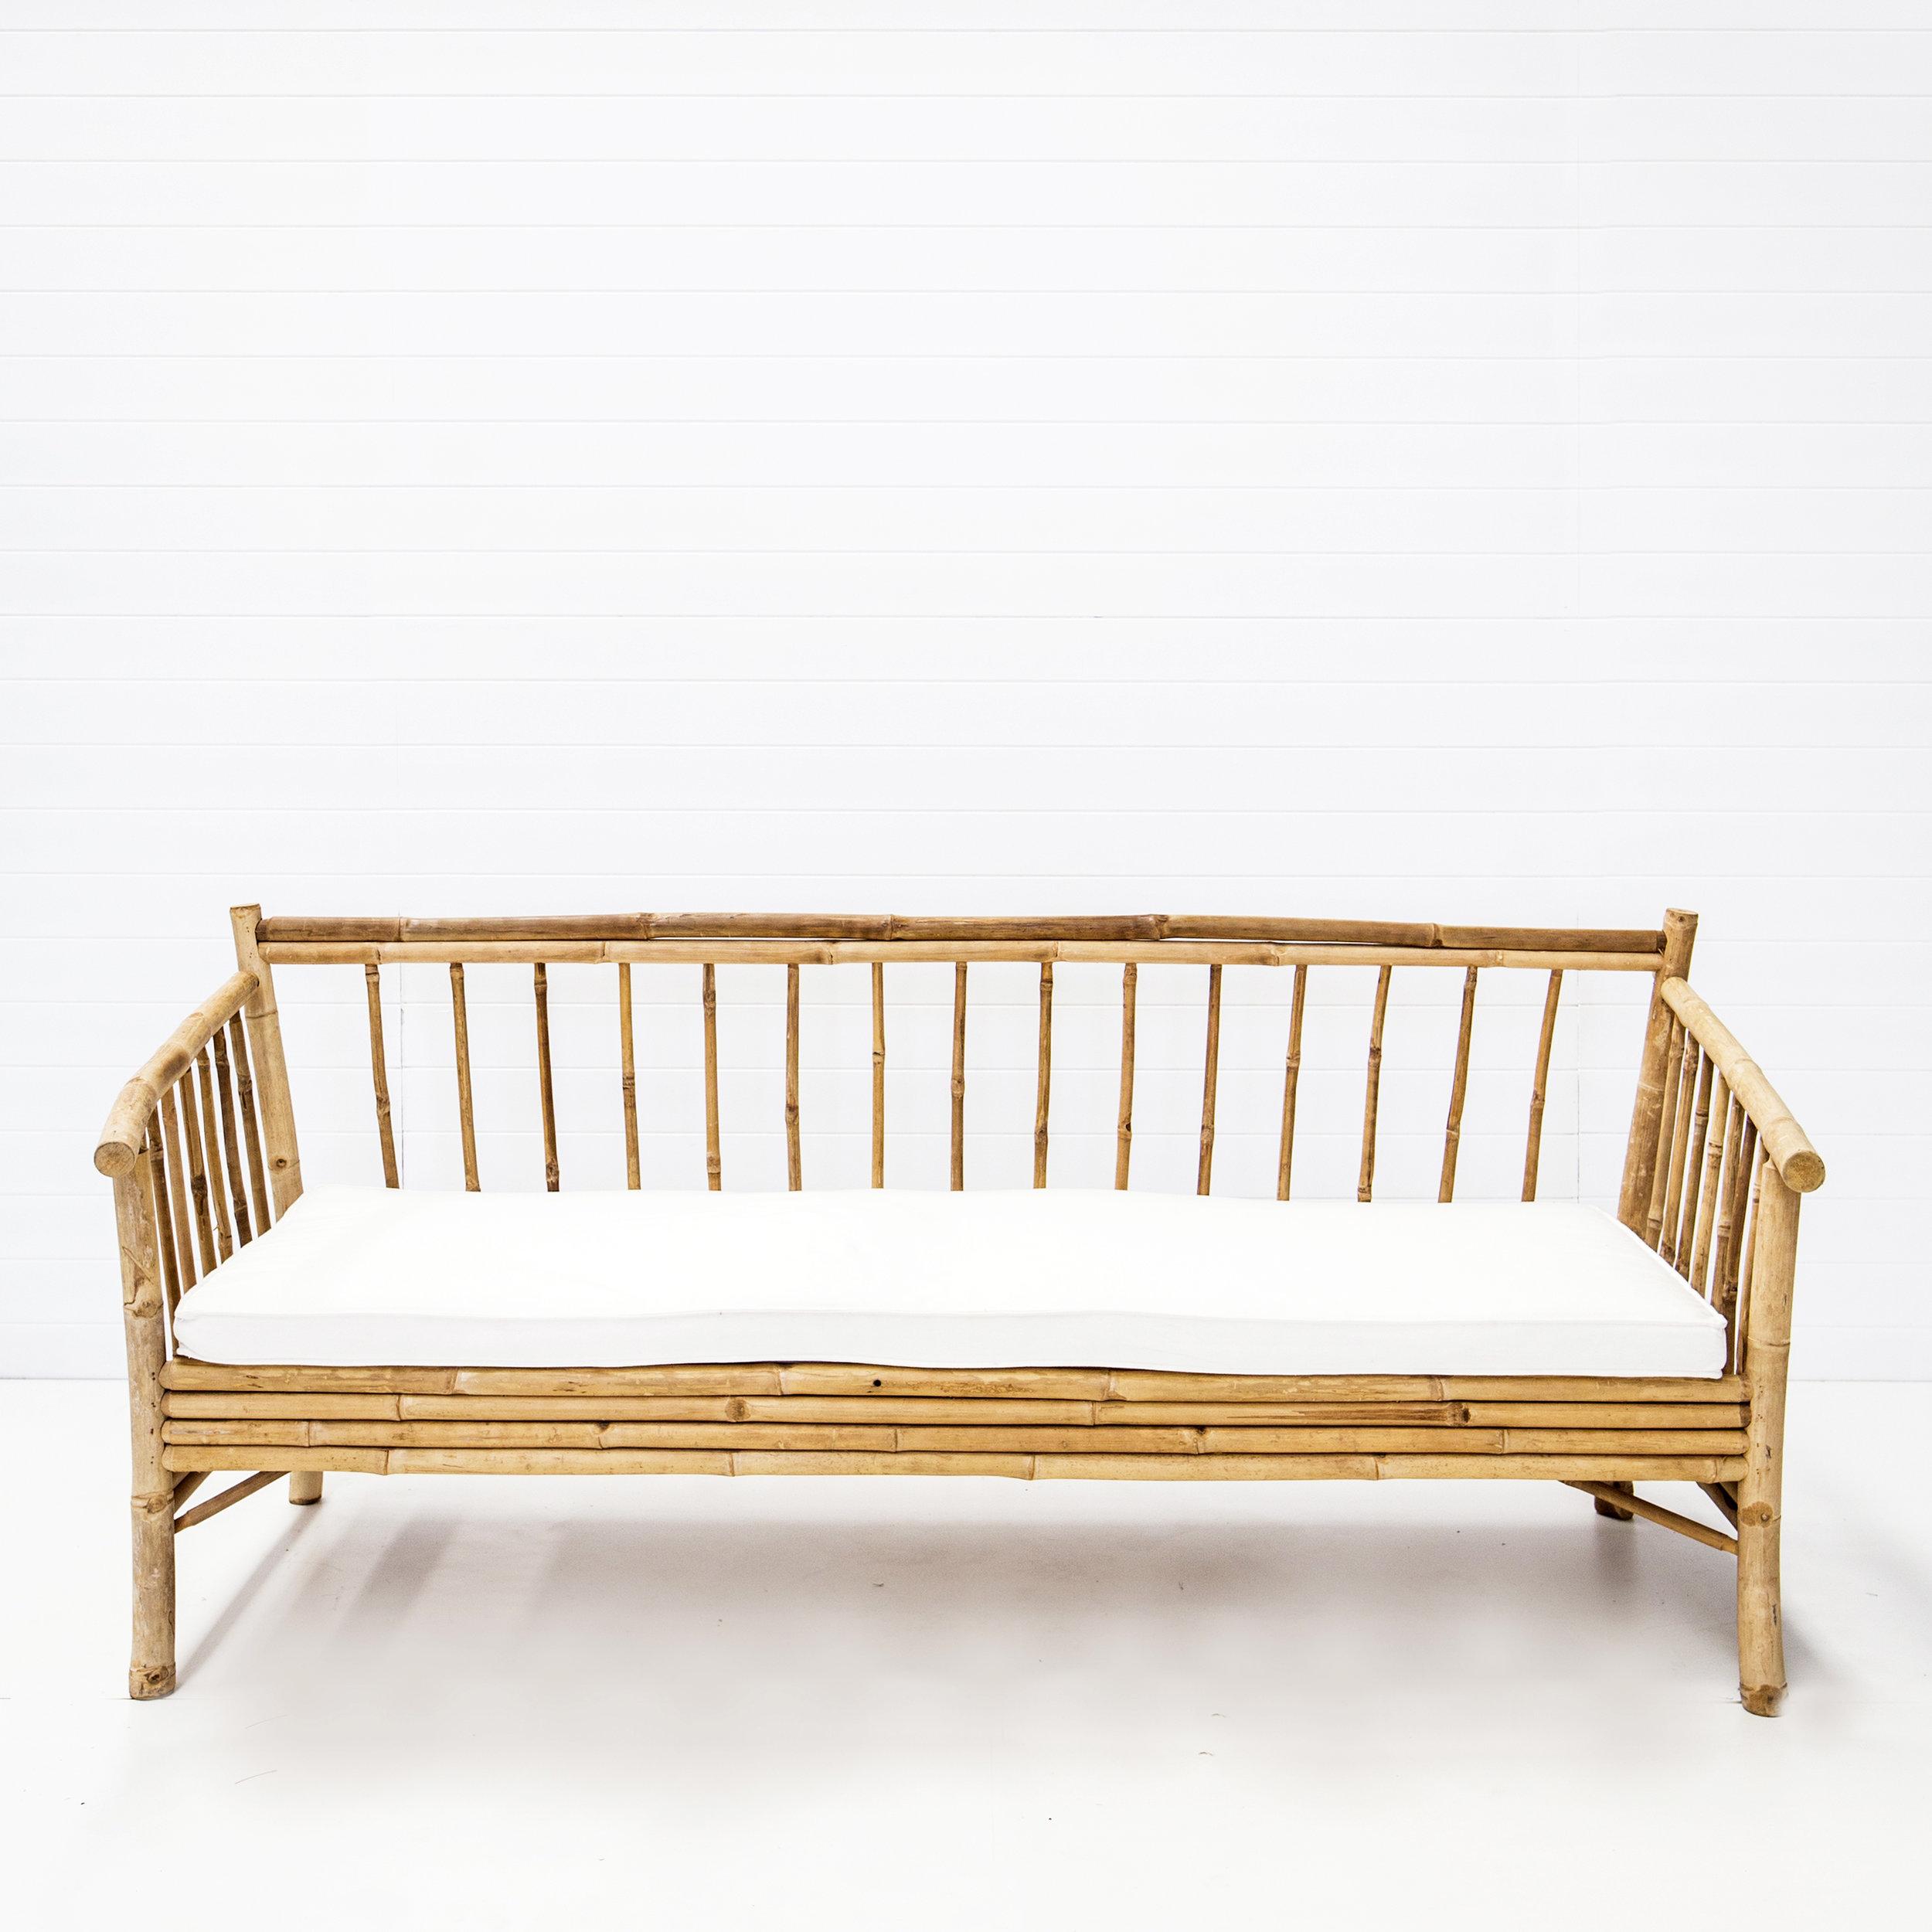 Bahamas Bamboo Sofa with White Seat Cushion